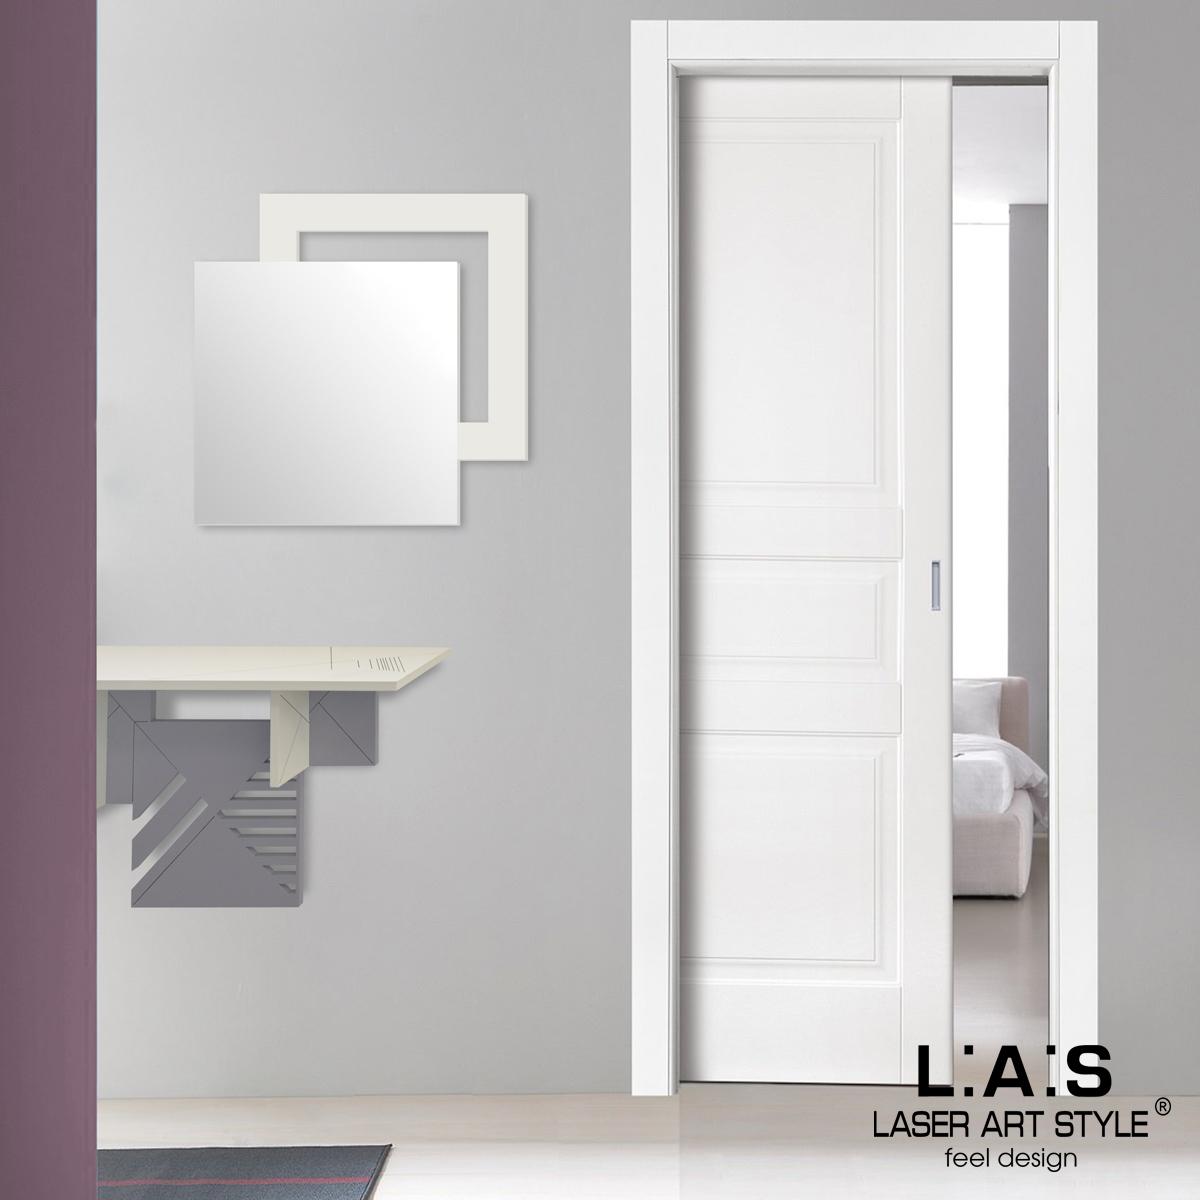 L:A:S - Laser Art Style - SPECCHIERA DESIGN MINIMAL SI-525 PANNA